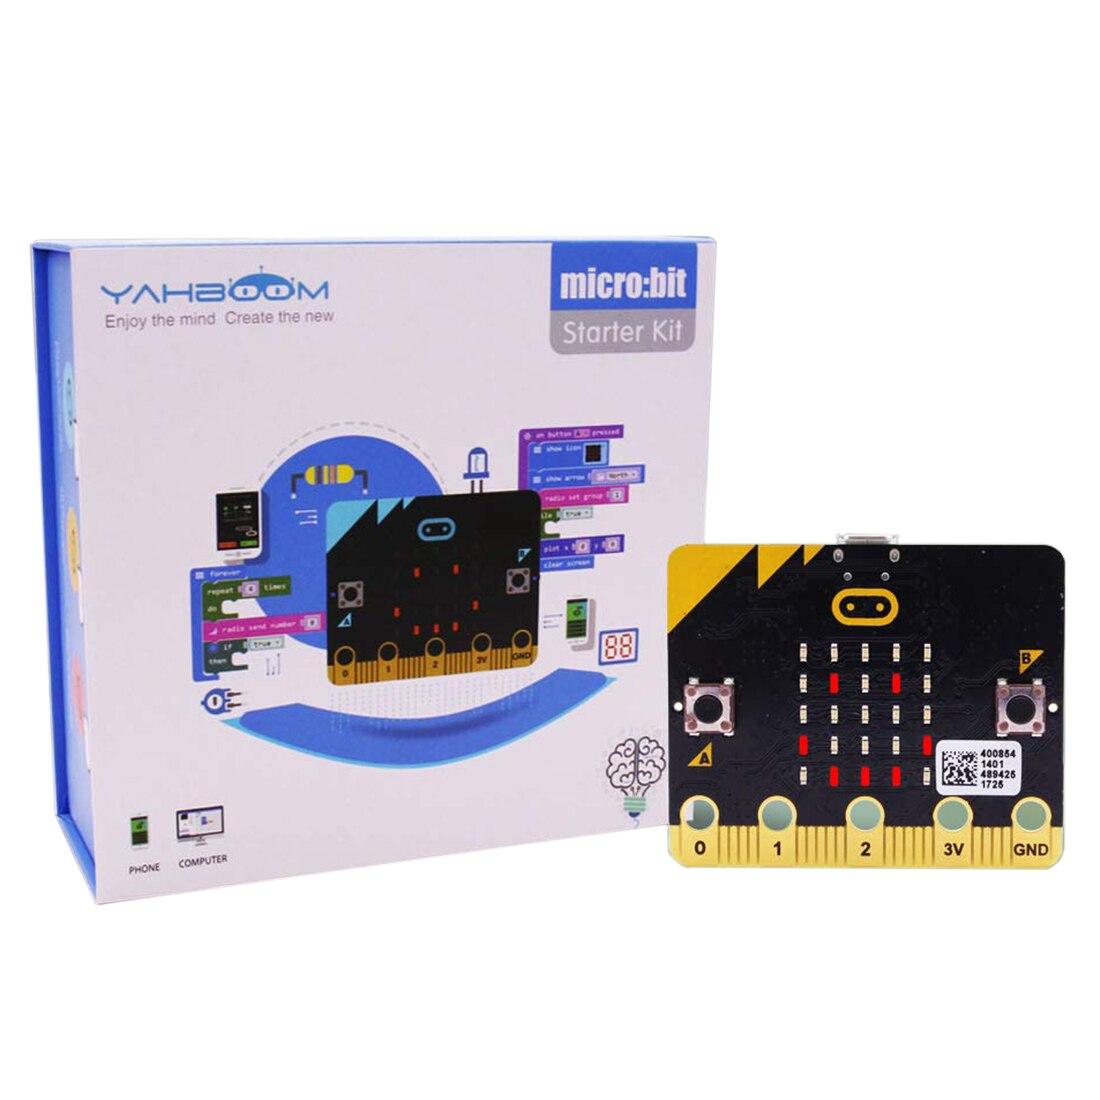 Micro:Bit Kit Starter Learning Kit Micro Bit Board Graphical Programmable STEM Toys Guidance Manual For Kids(Micro:Bit Board)